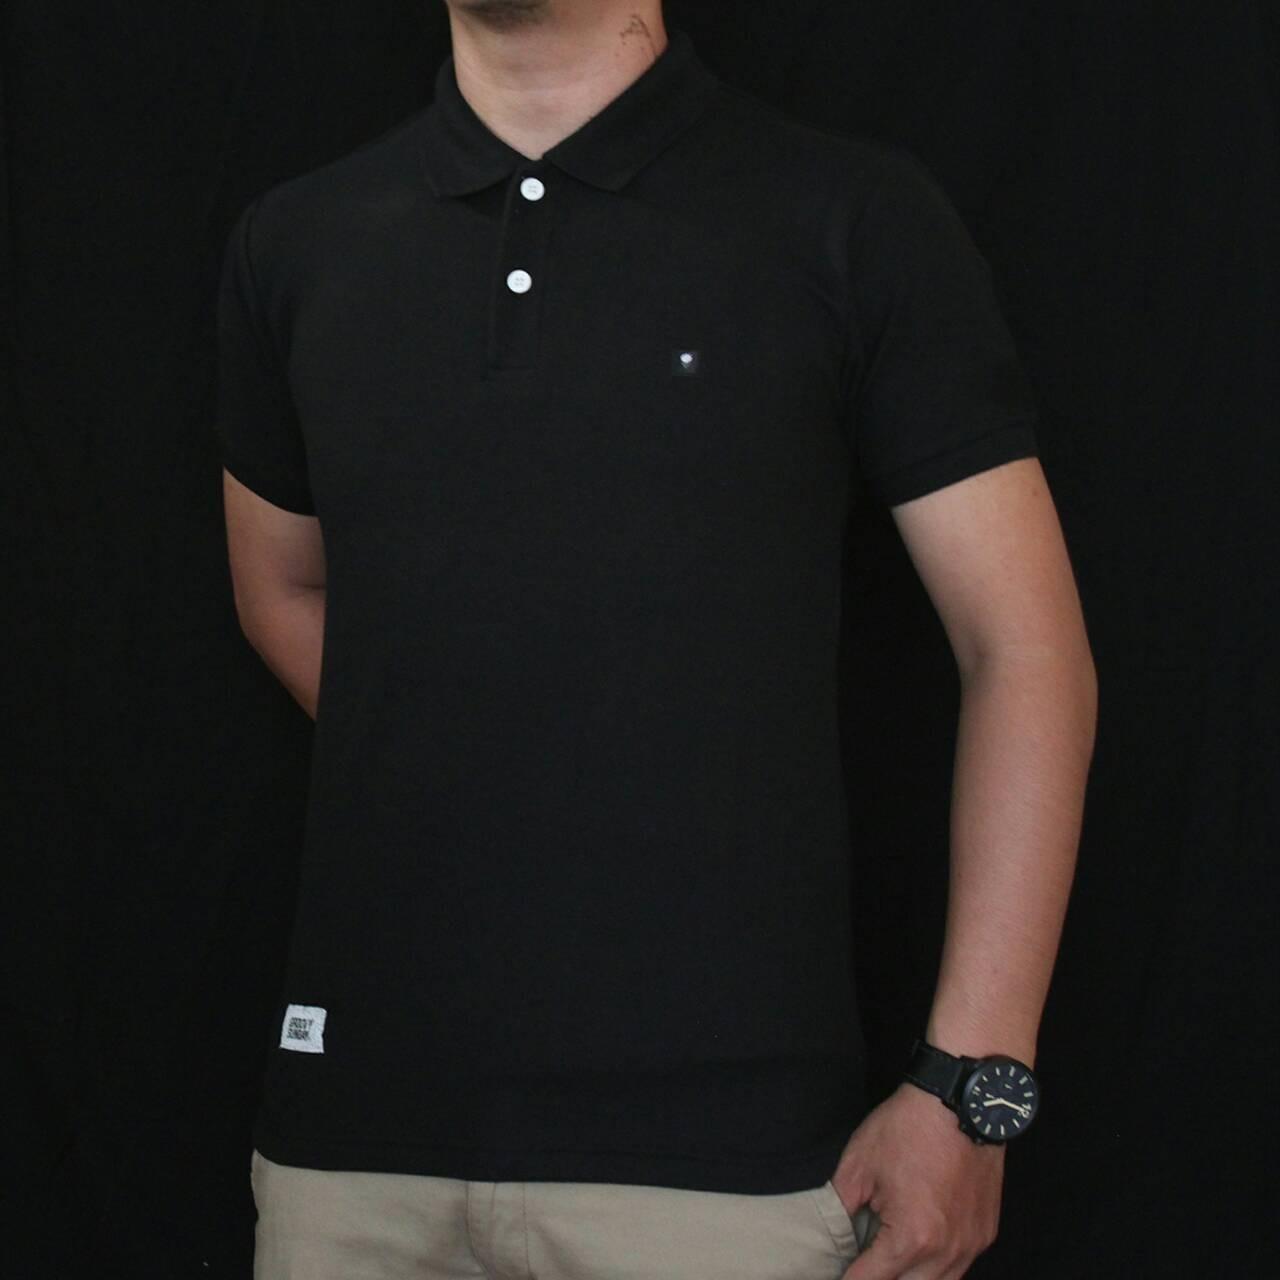 Urgent Clothing Kaos kerah Pria All size kombinasi warna